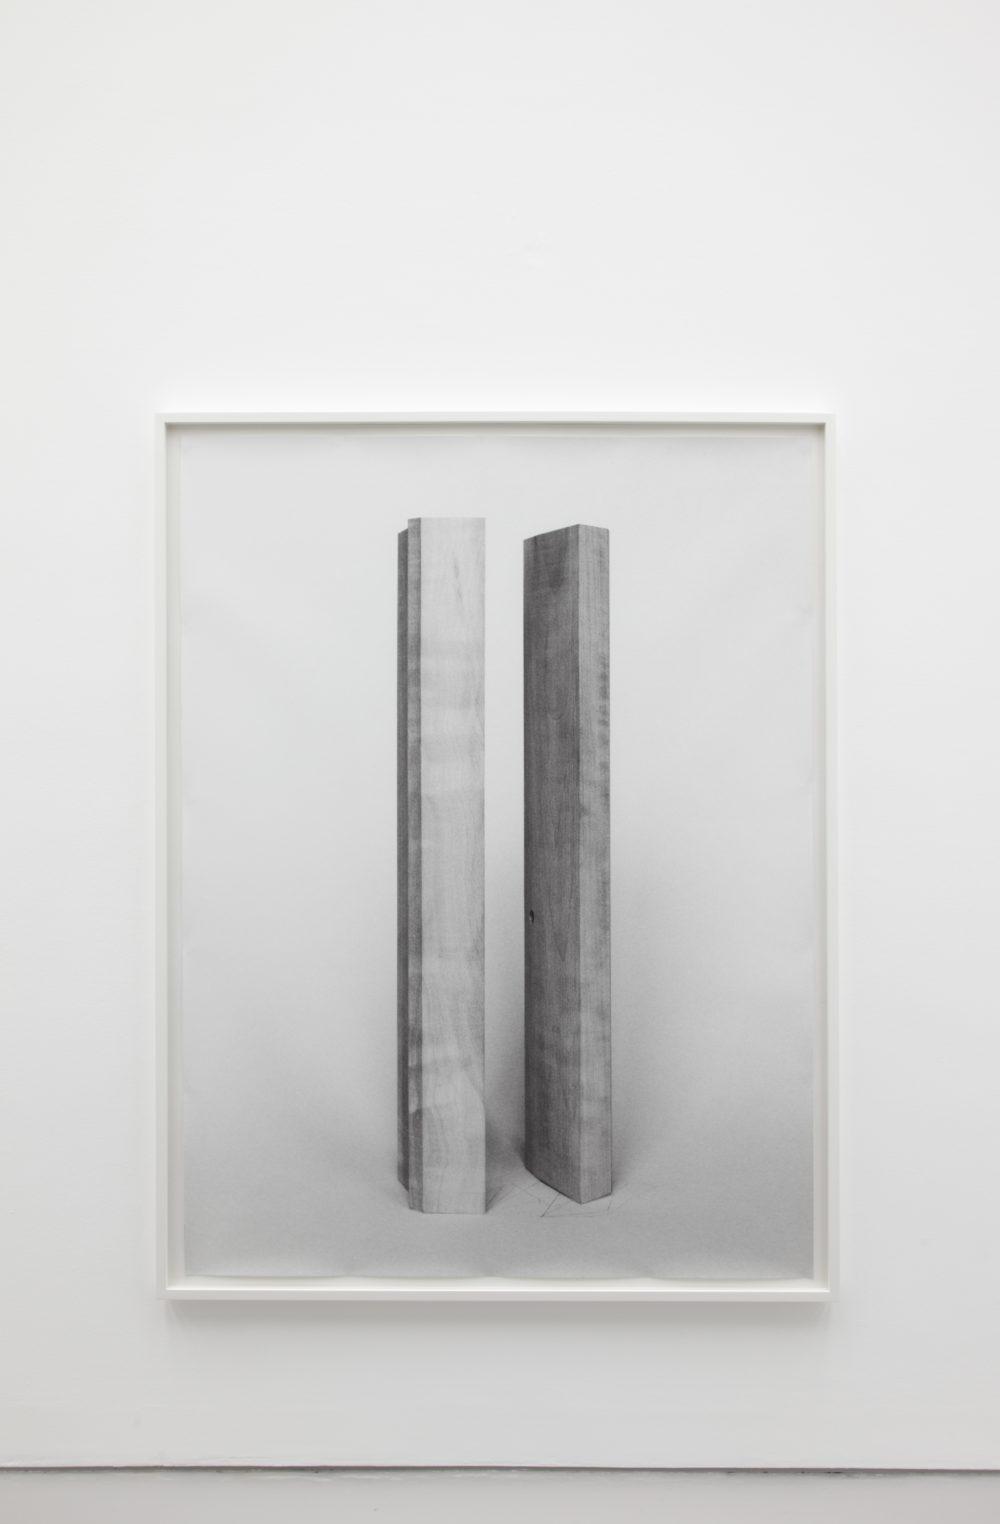 Becky Beasley, Spring Rain (2013) installation view, Spike Island, Bristol